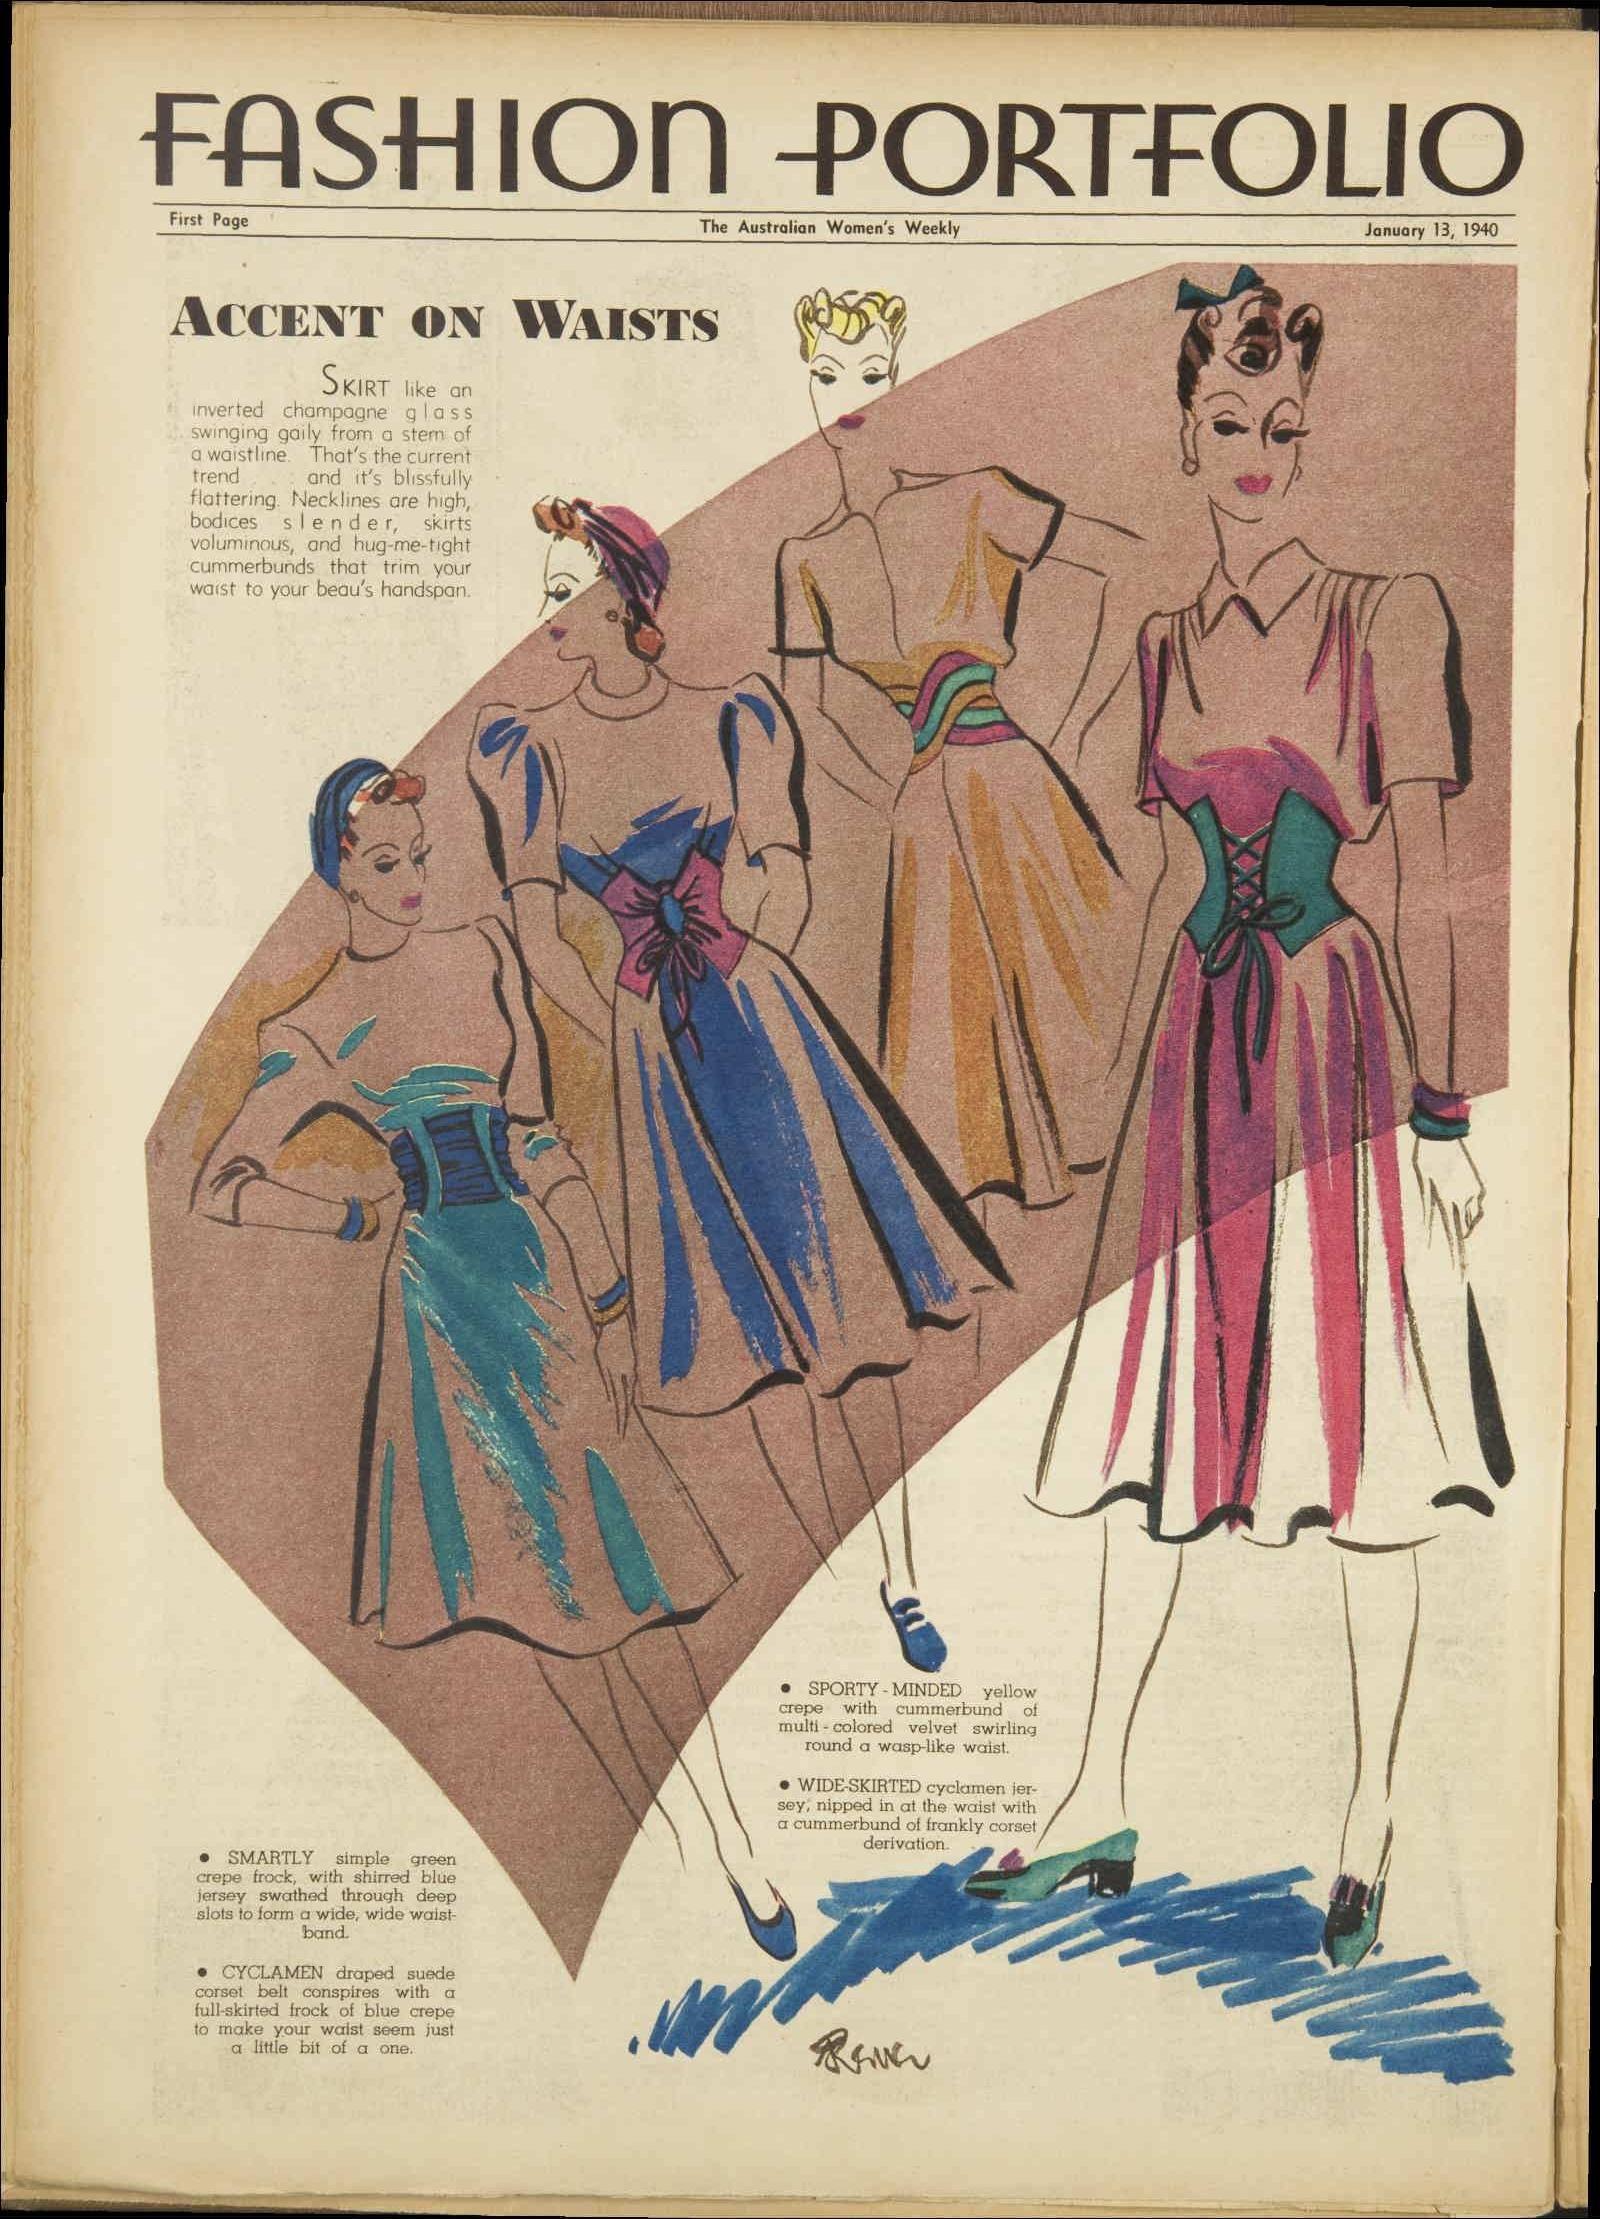 Australian womens weekly 1940 fashion illustration